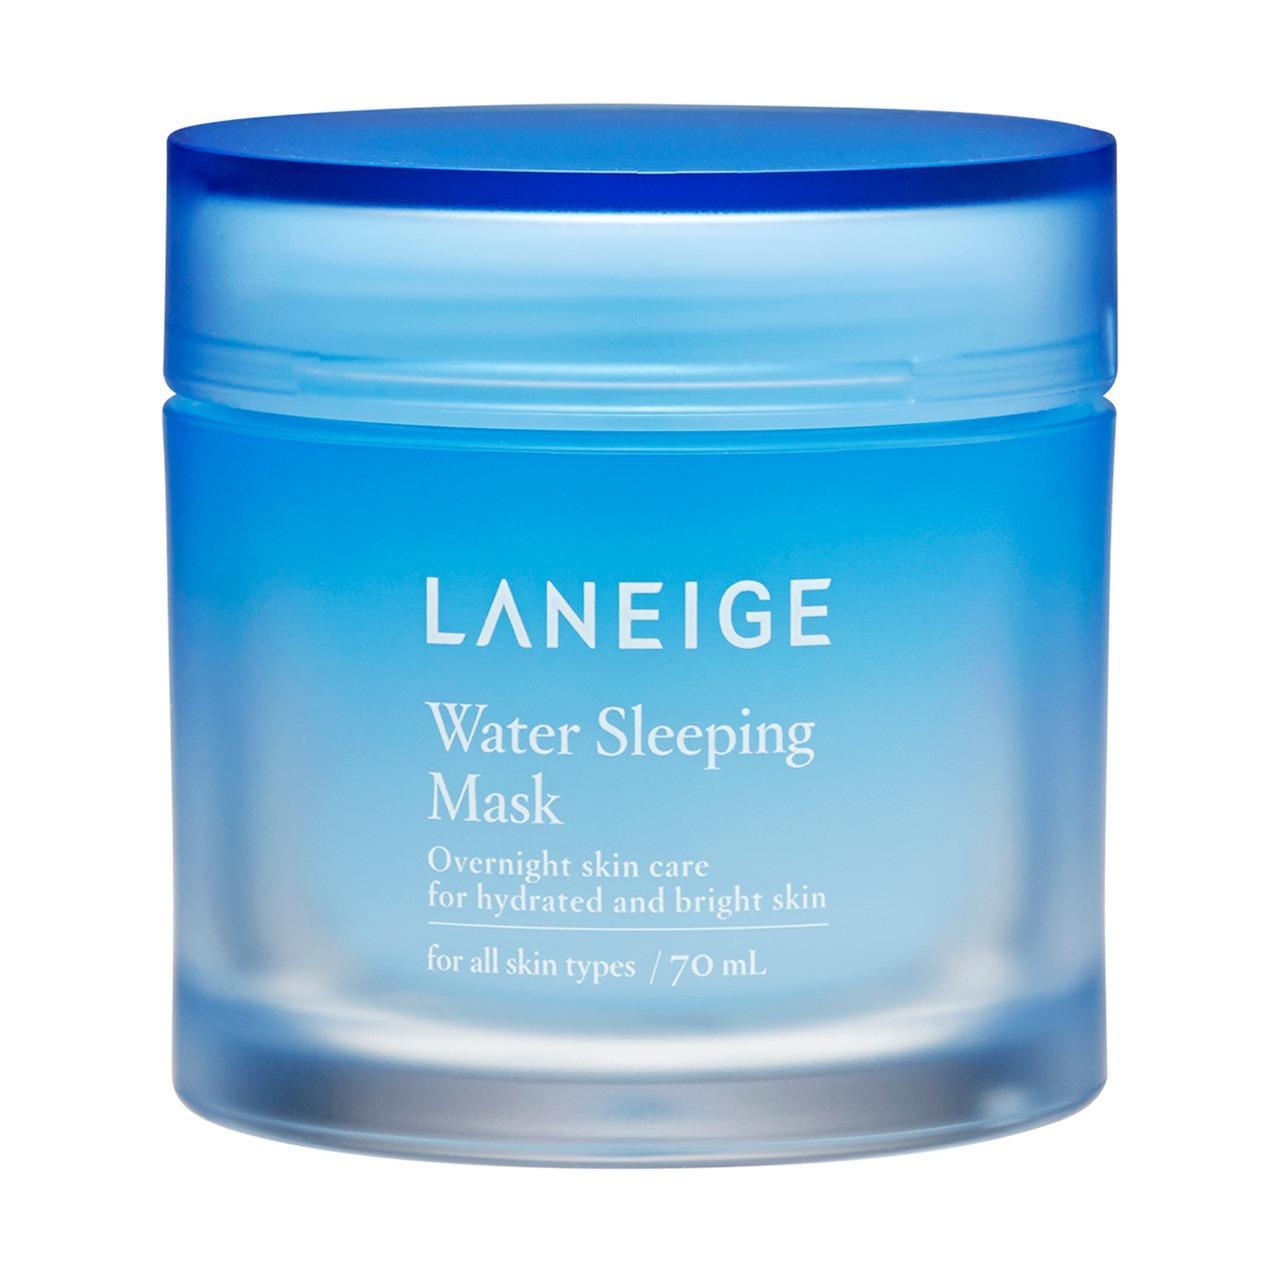 Price Laneige Water Sleeping Mask 70Ml Laneige